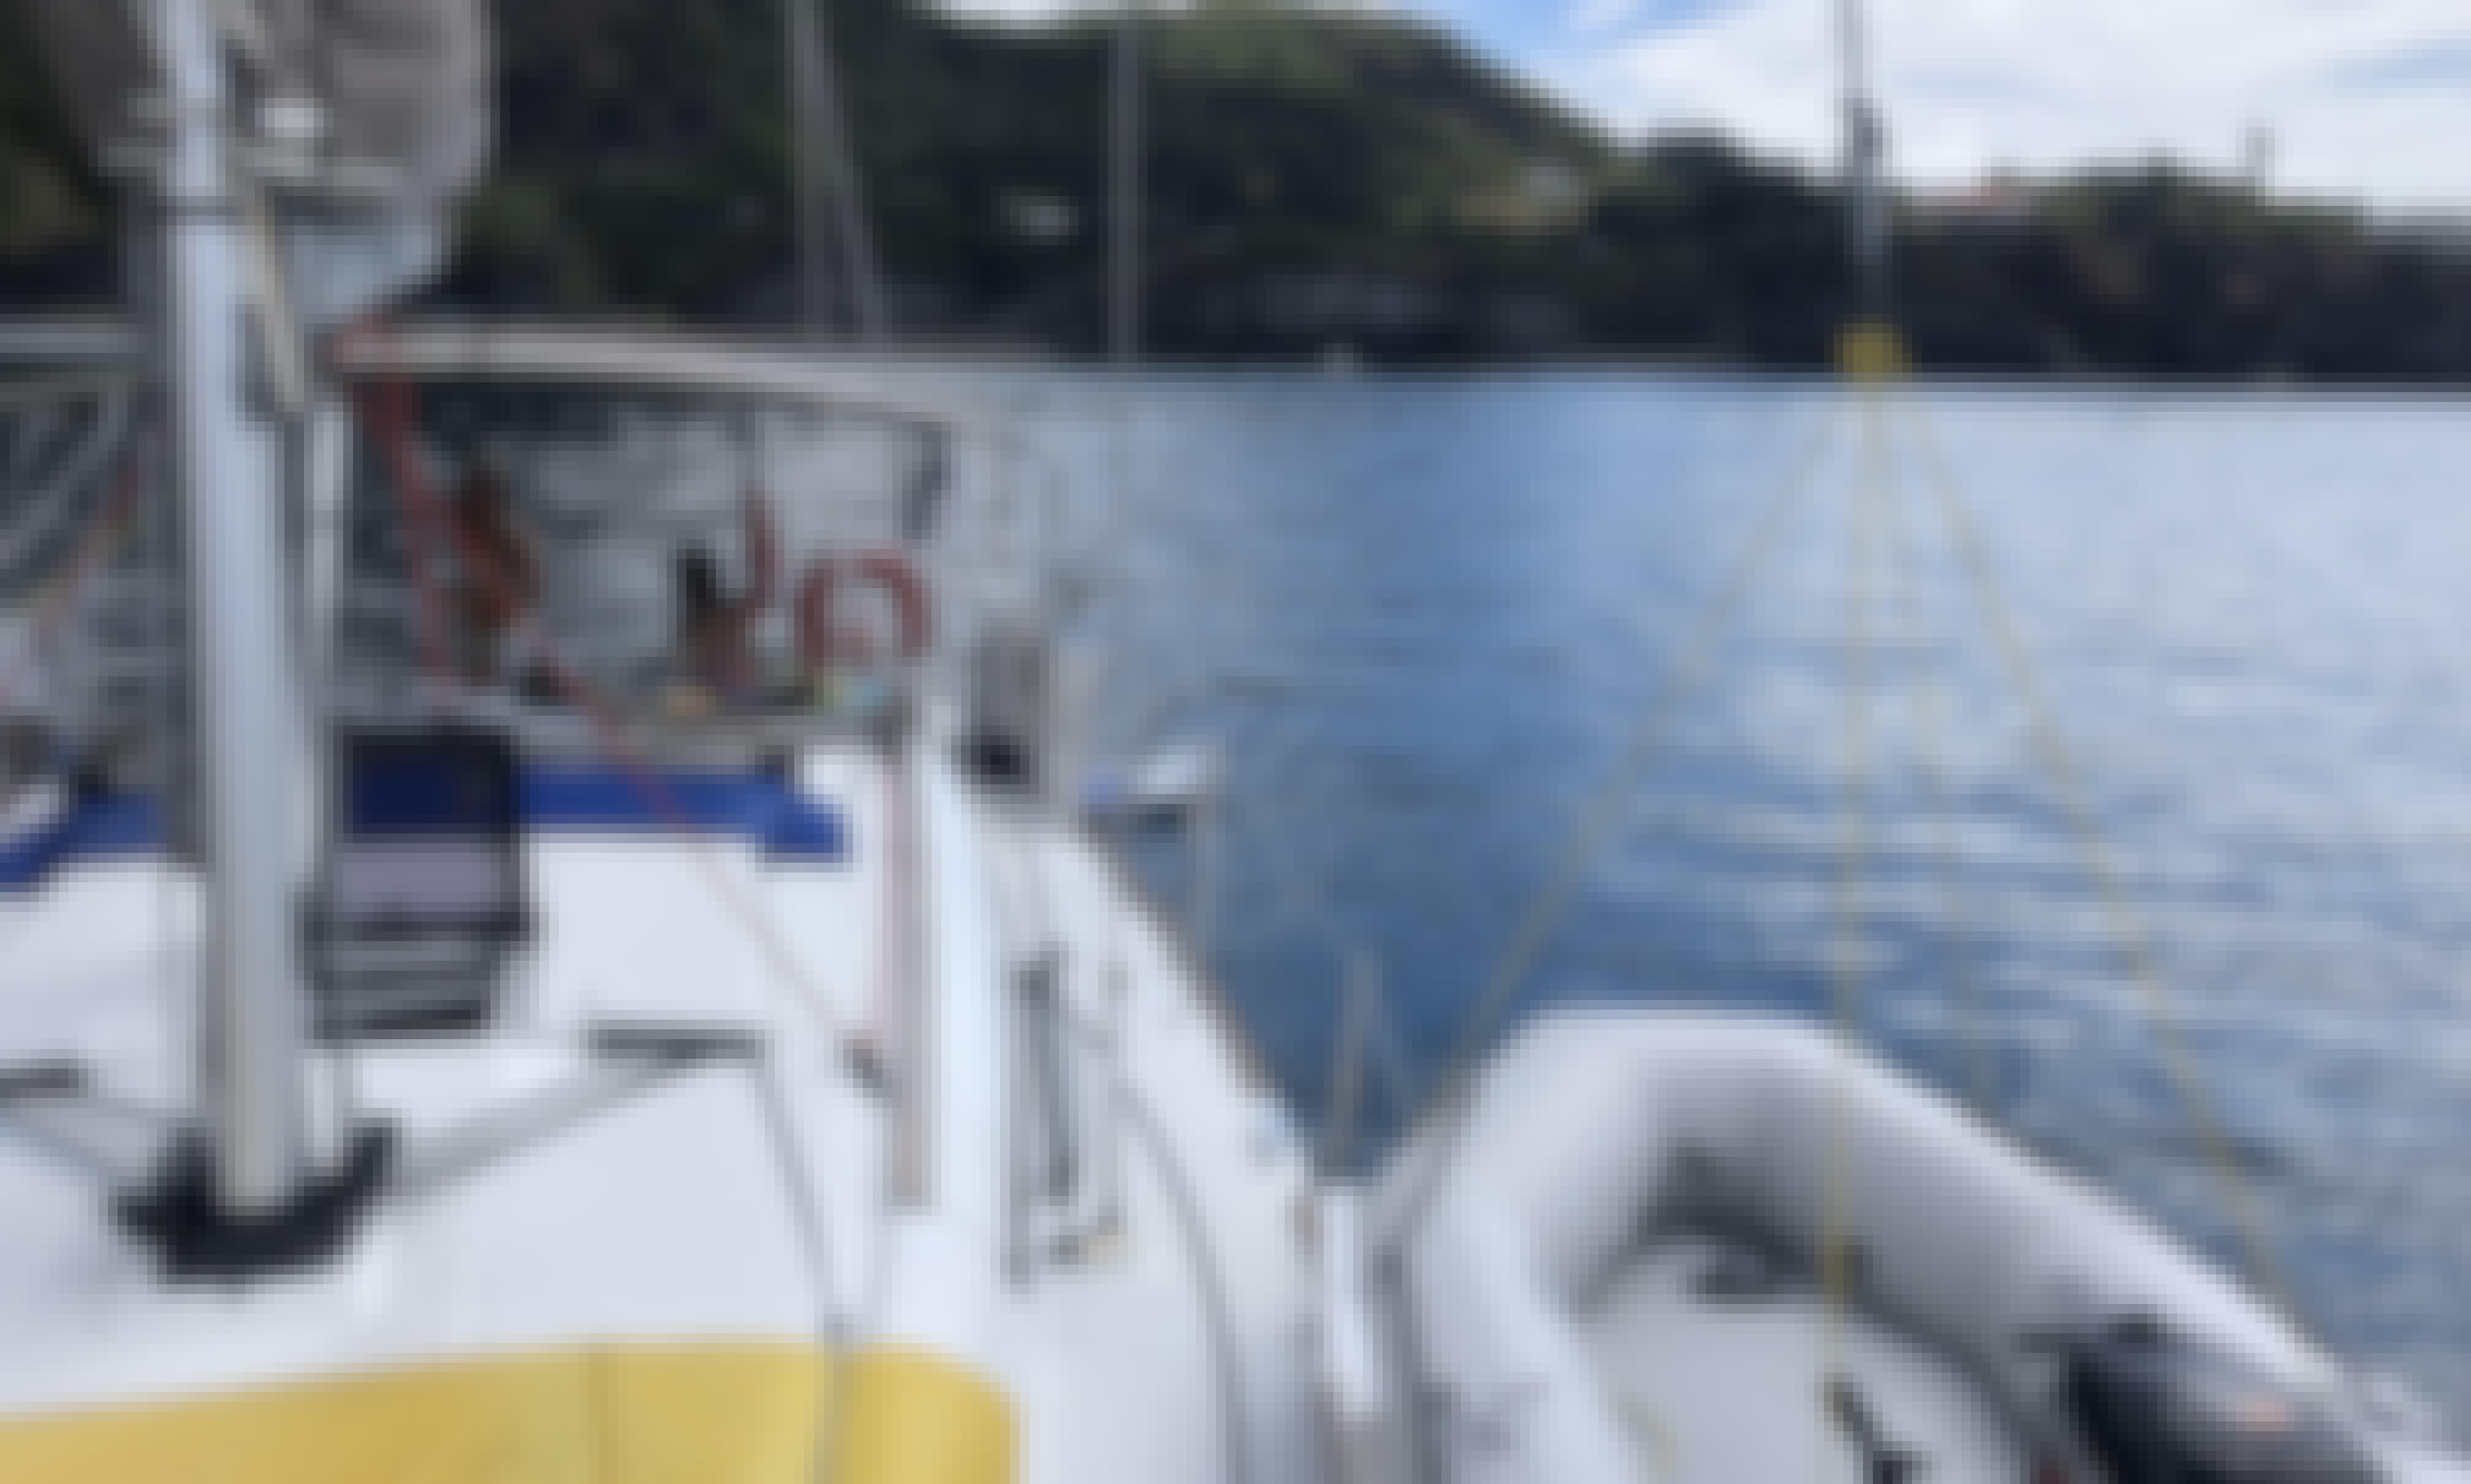 Live Aboard - Overnight & Sailing Charter in in Ponta Delgada, Açores